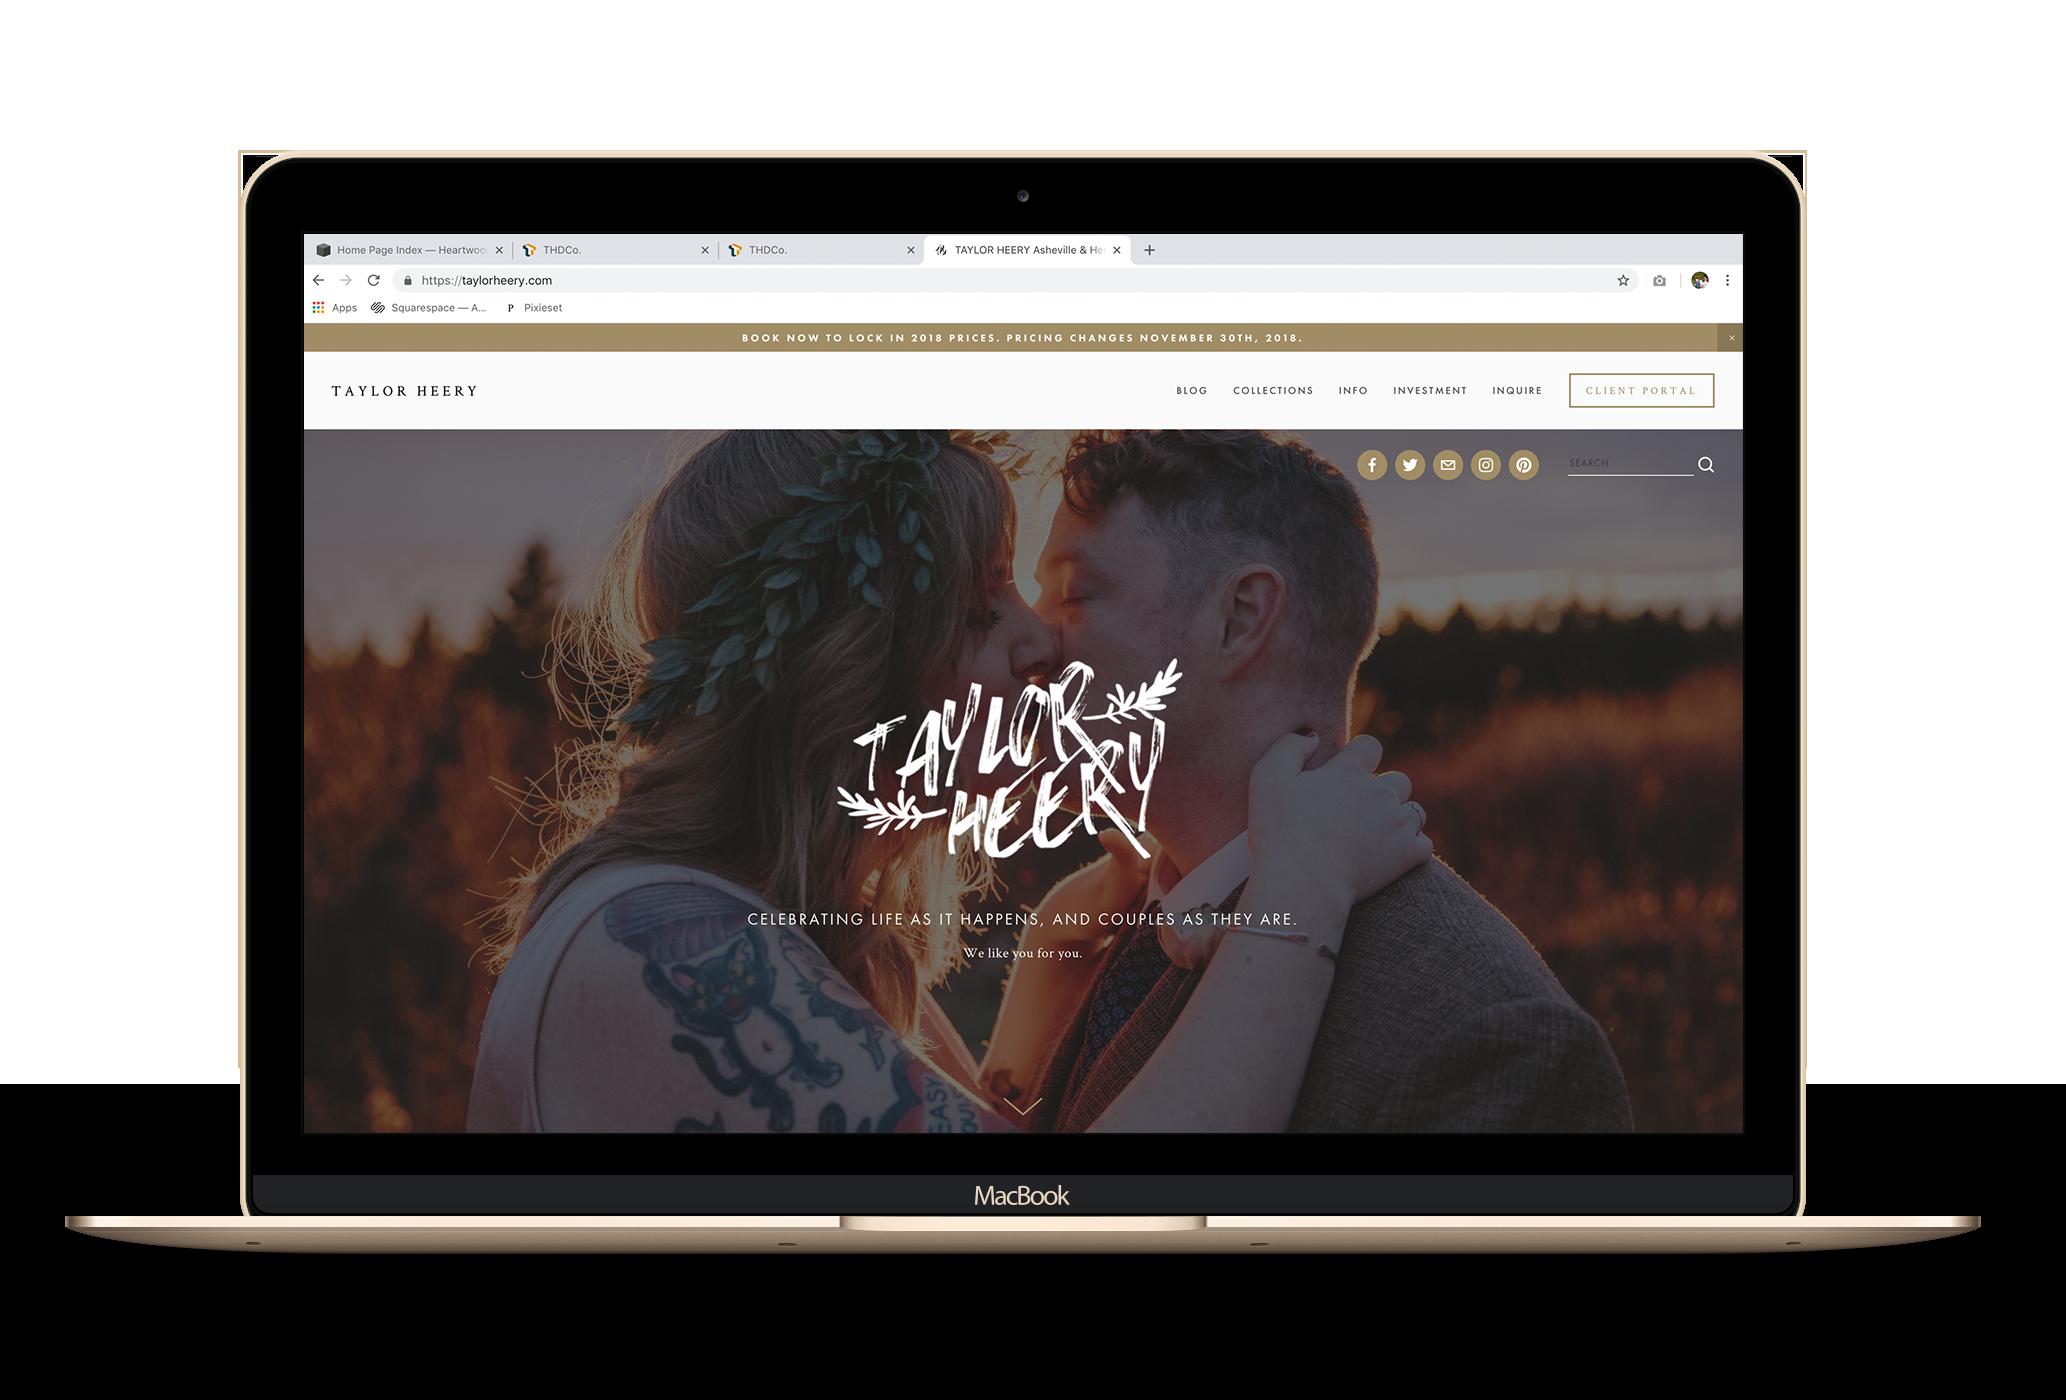 002-MacBook-Goldthp.png